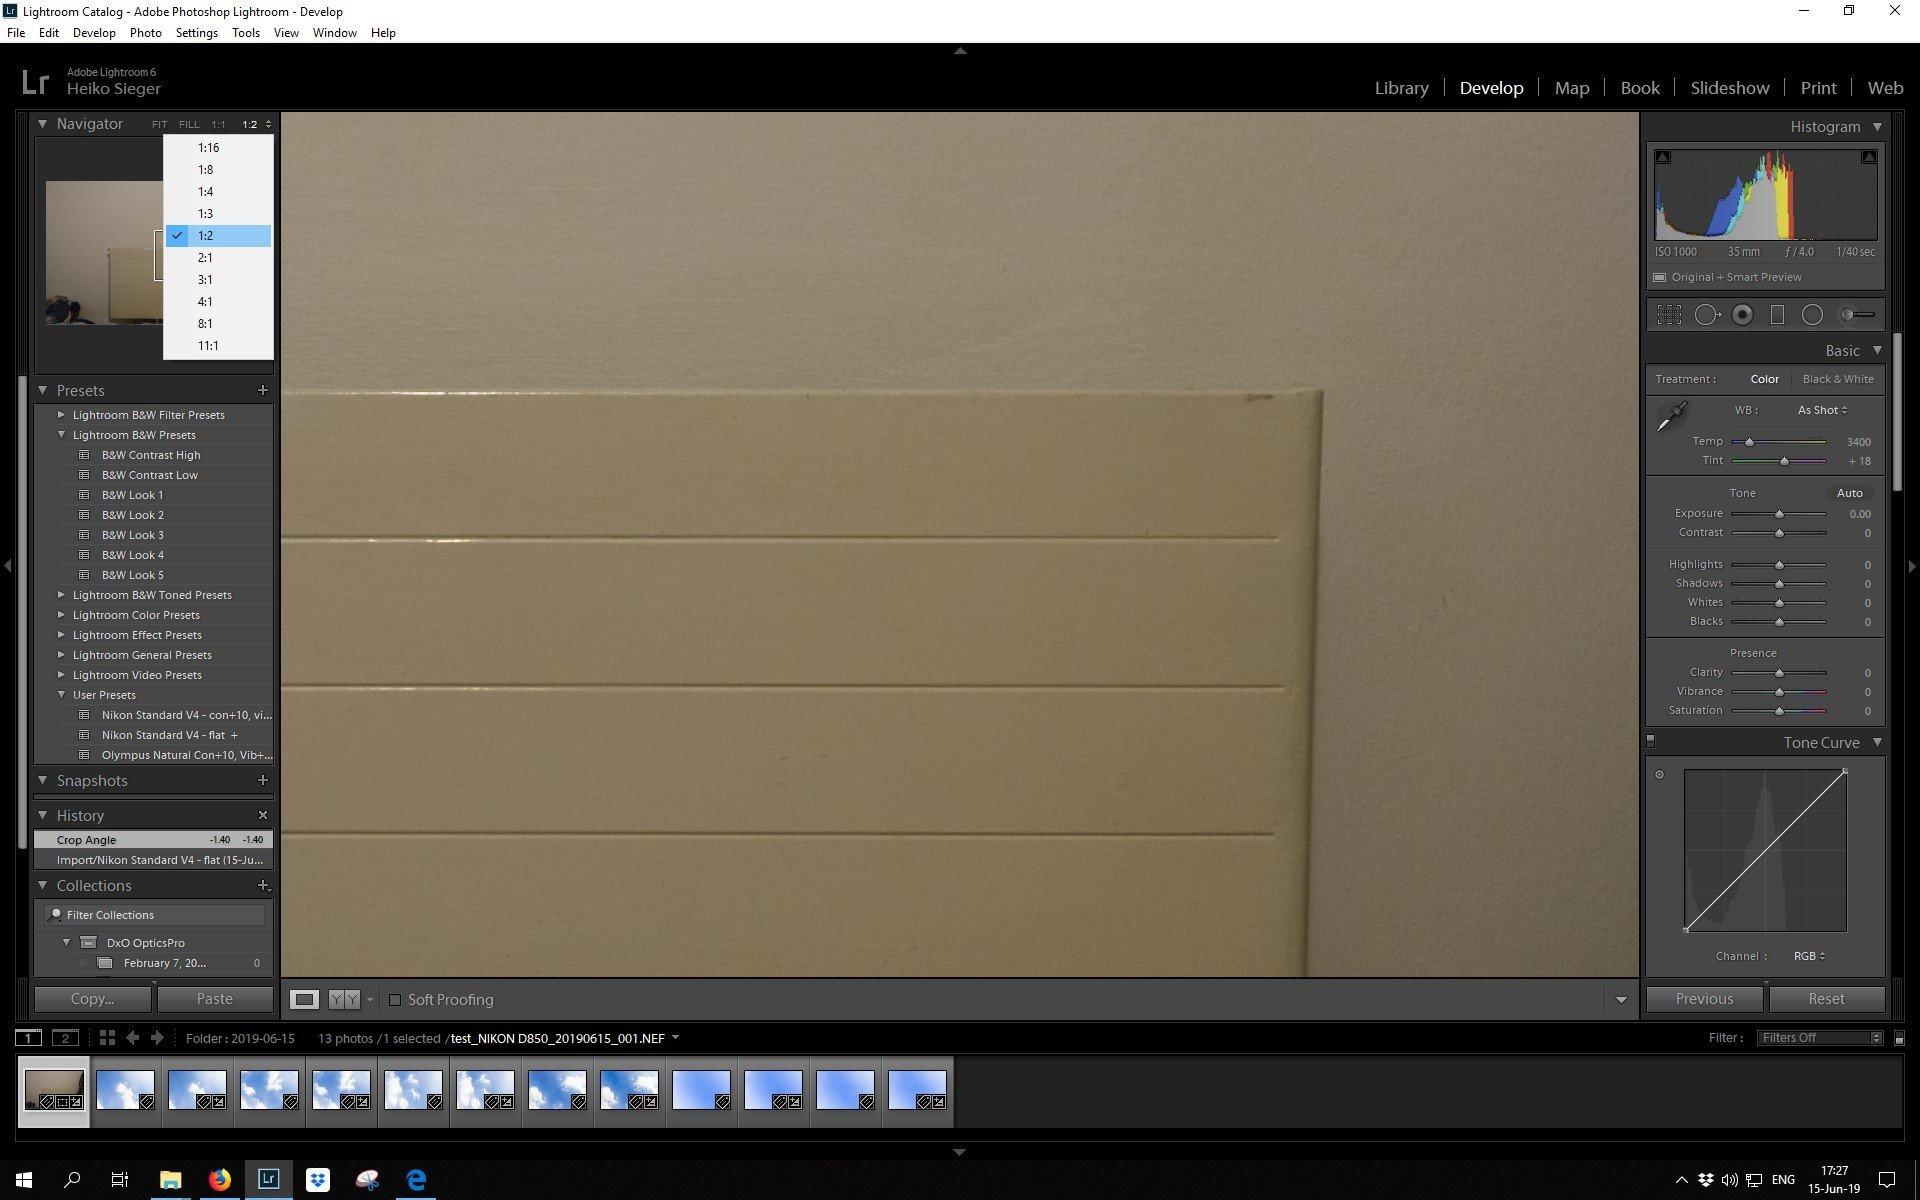 Nikon D850 - First Impressions - Heiko's Blog